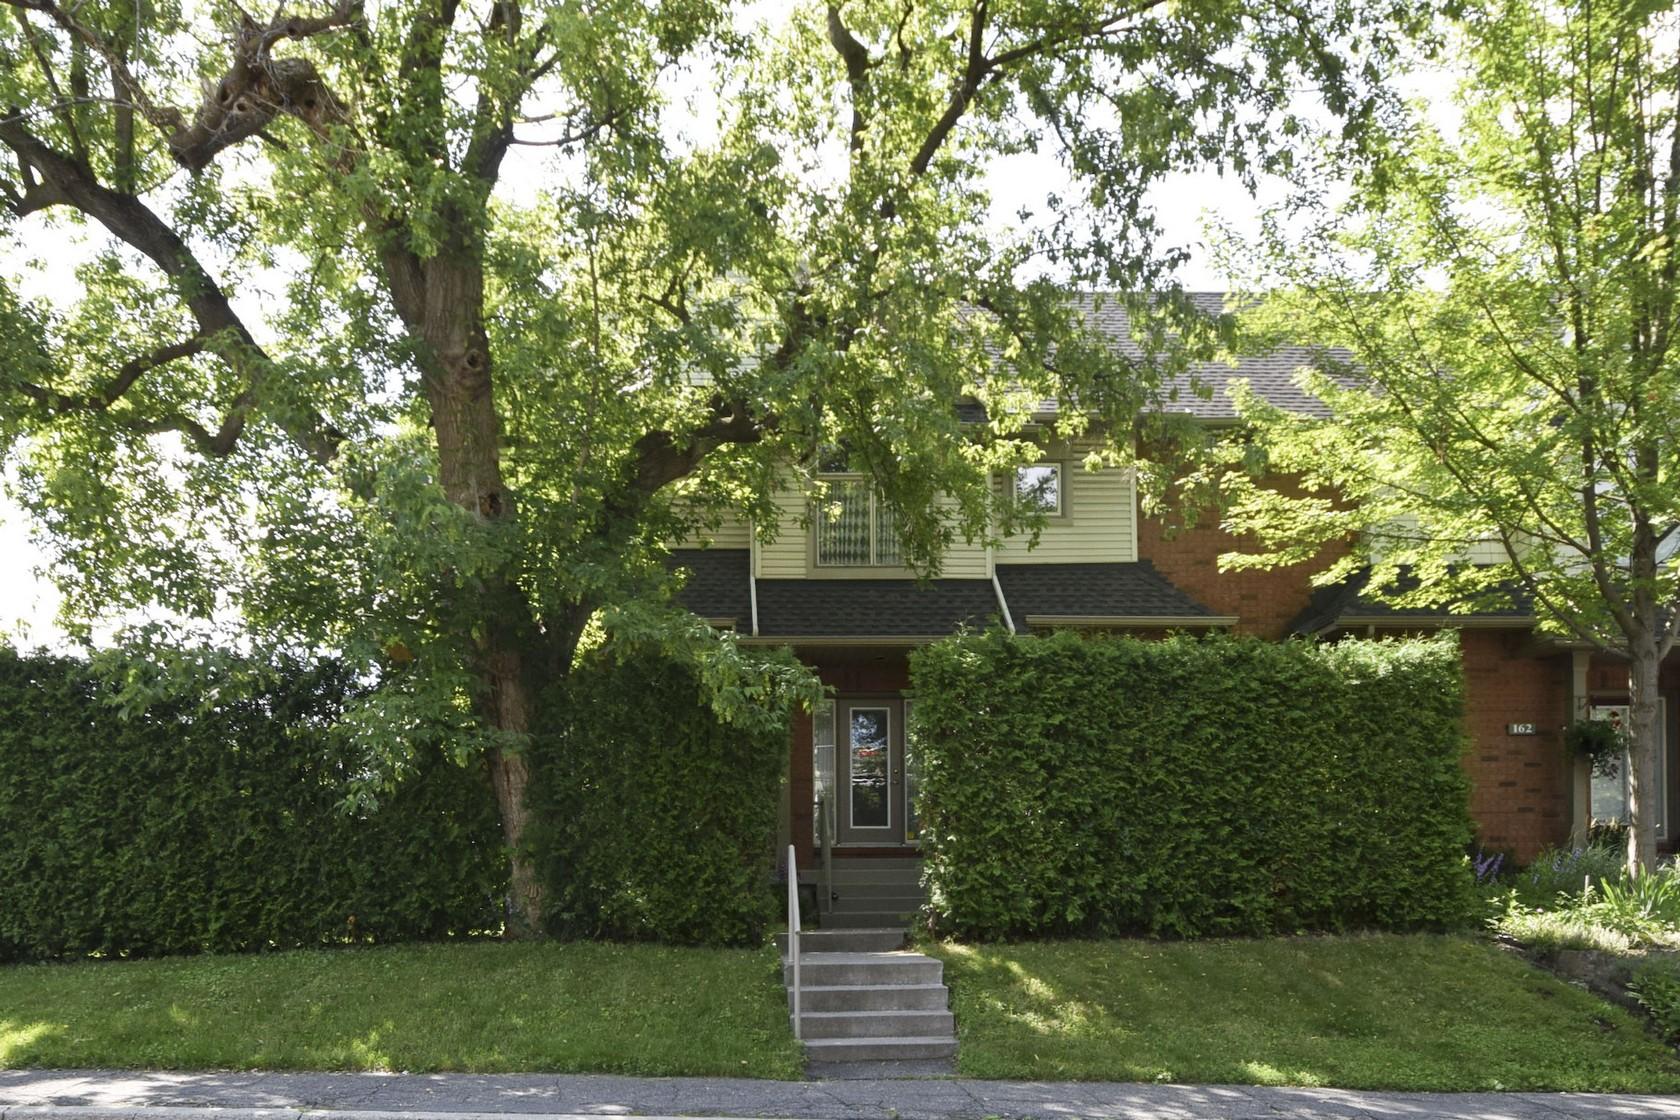 158 Hopewell Avenue | Modern Semi-Detached Home Steps from the Glebe Market